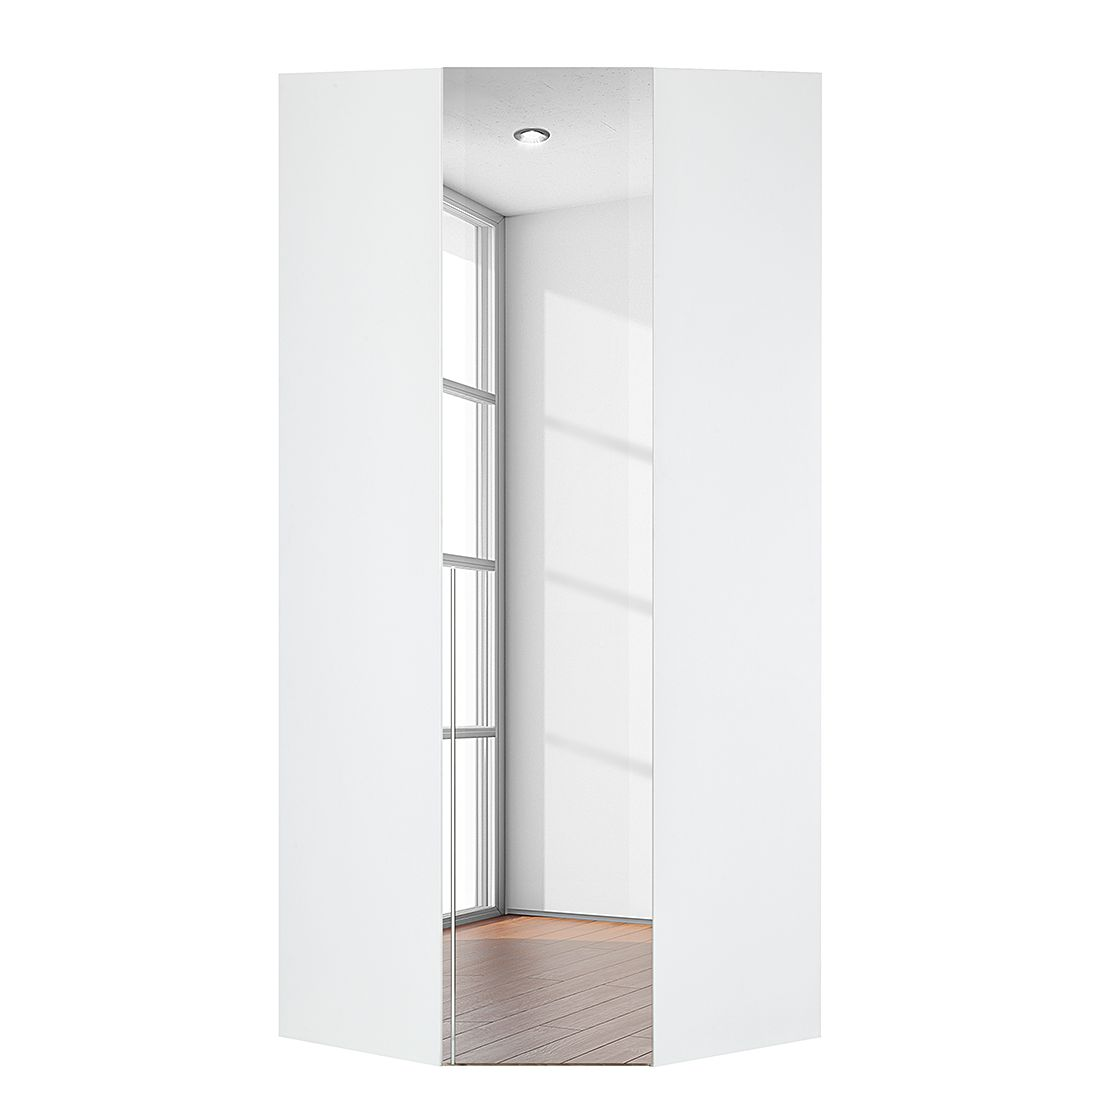 Armoire d'angle Brooklyn III - Blanc polaire / Miroir - 216 cm, Express Möbel